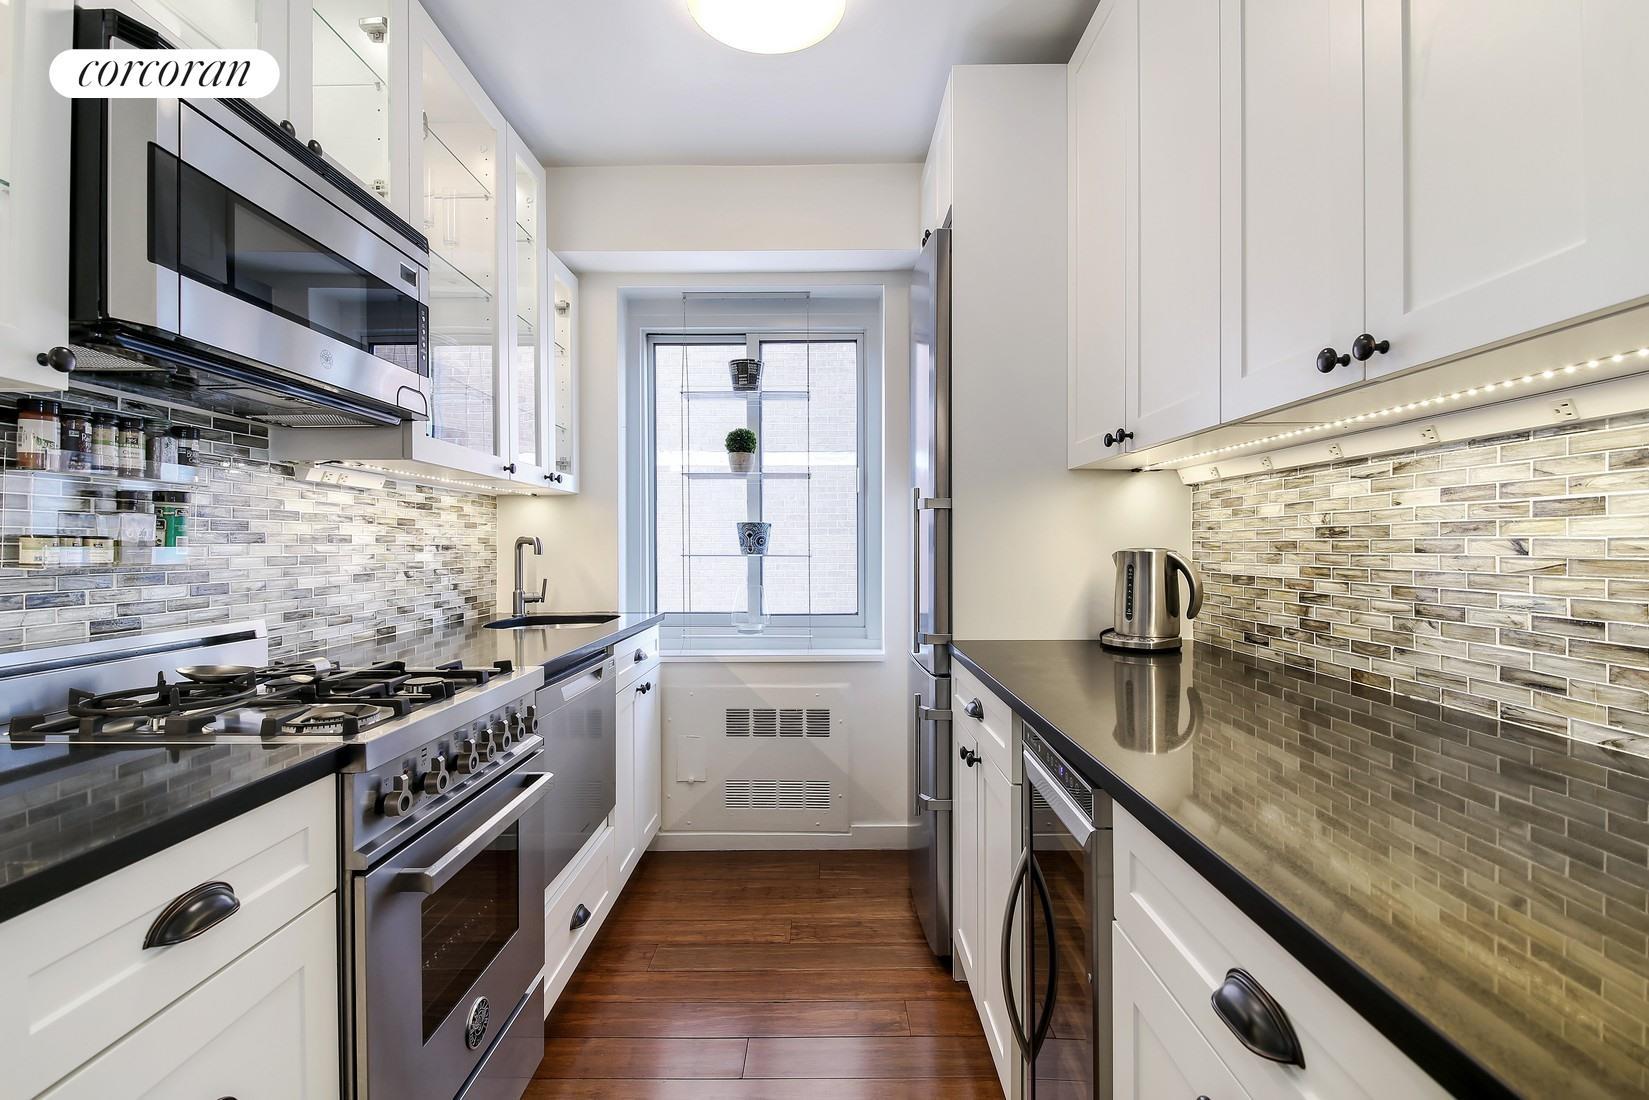 Corcoran, 420 East 58th Street, Apt. 25B, Sutton Area Rentals ...